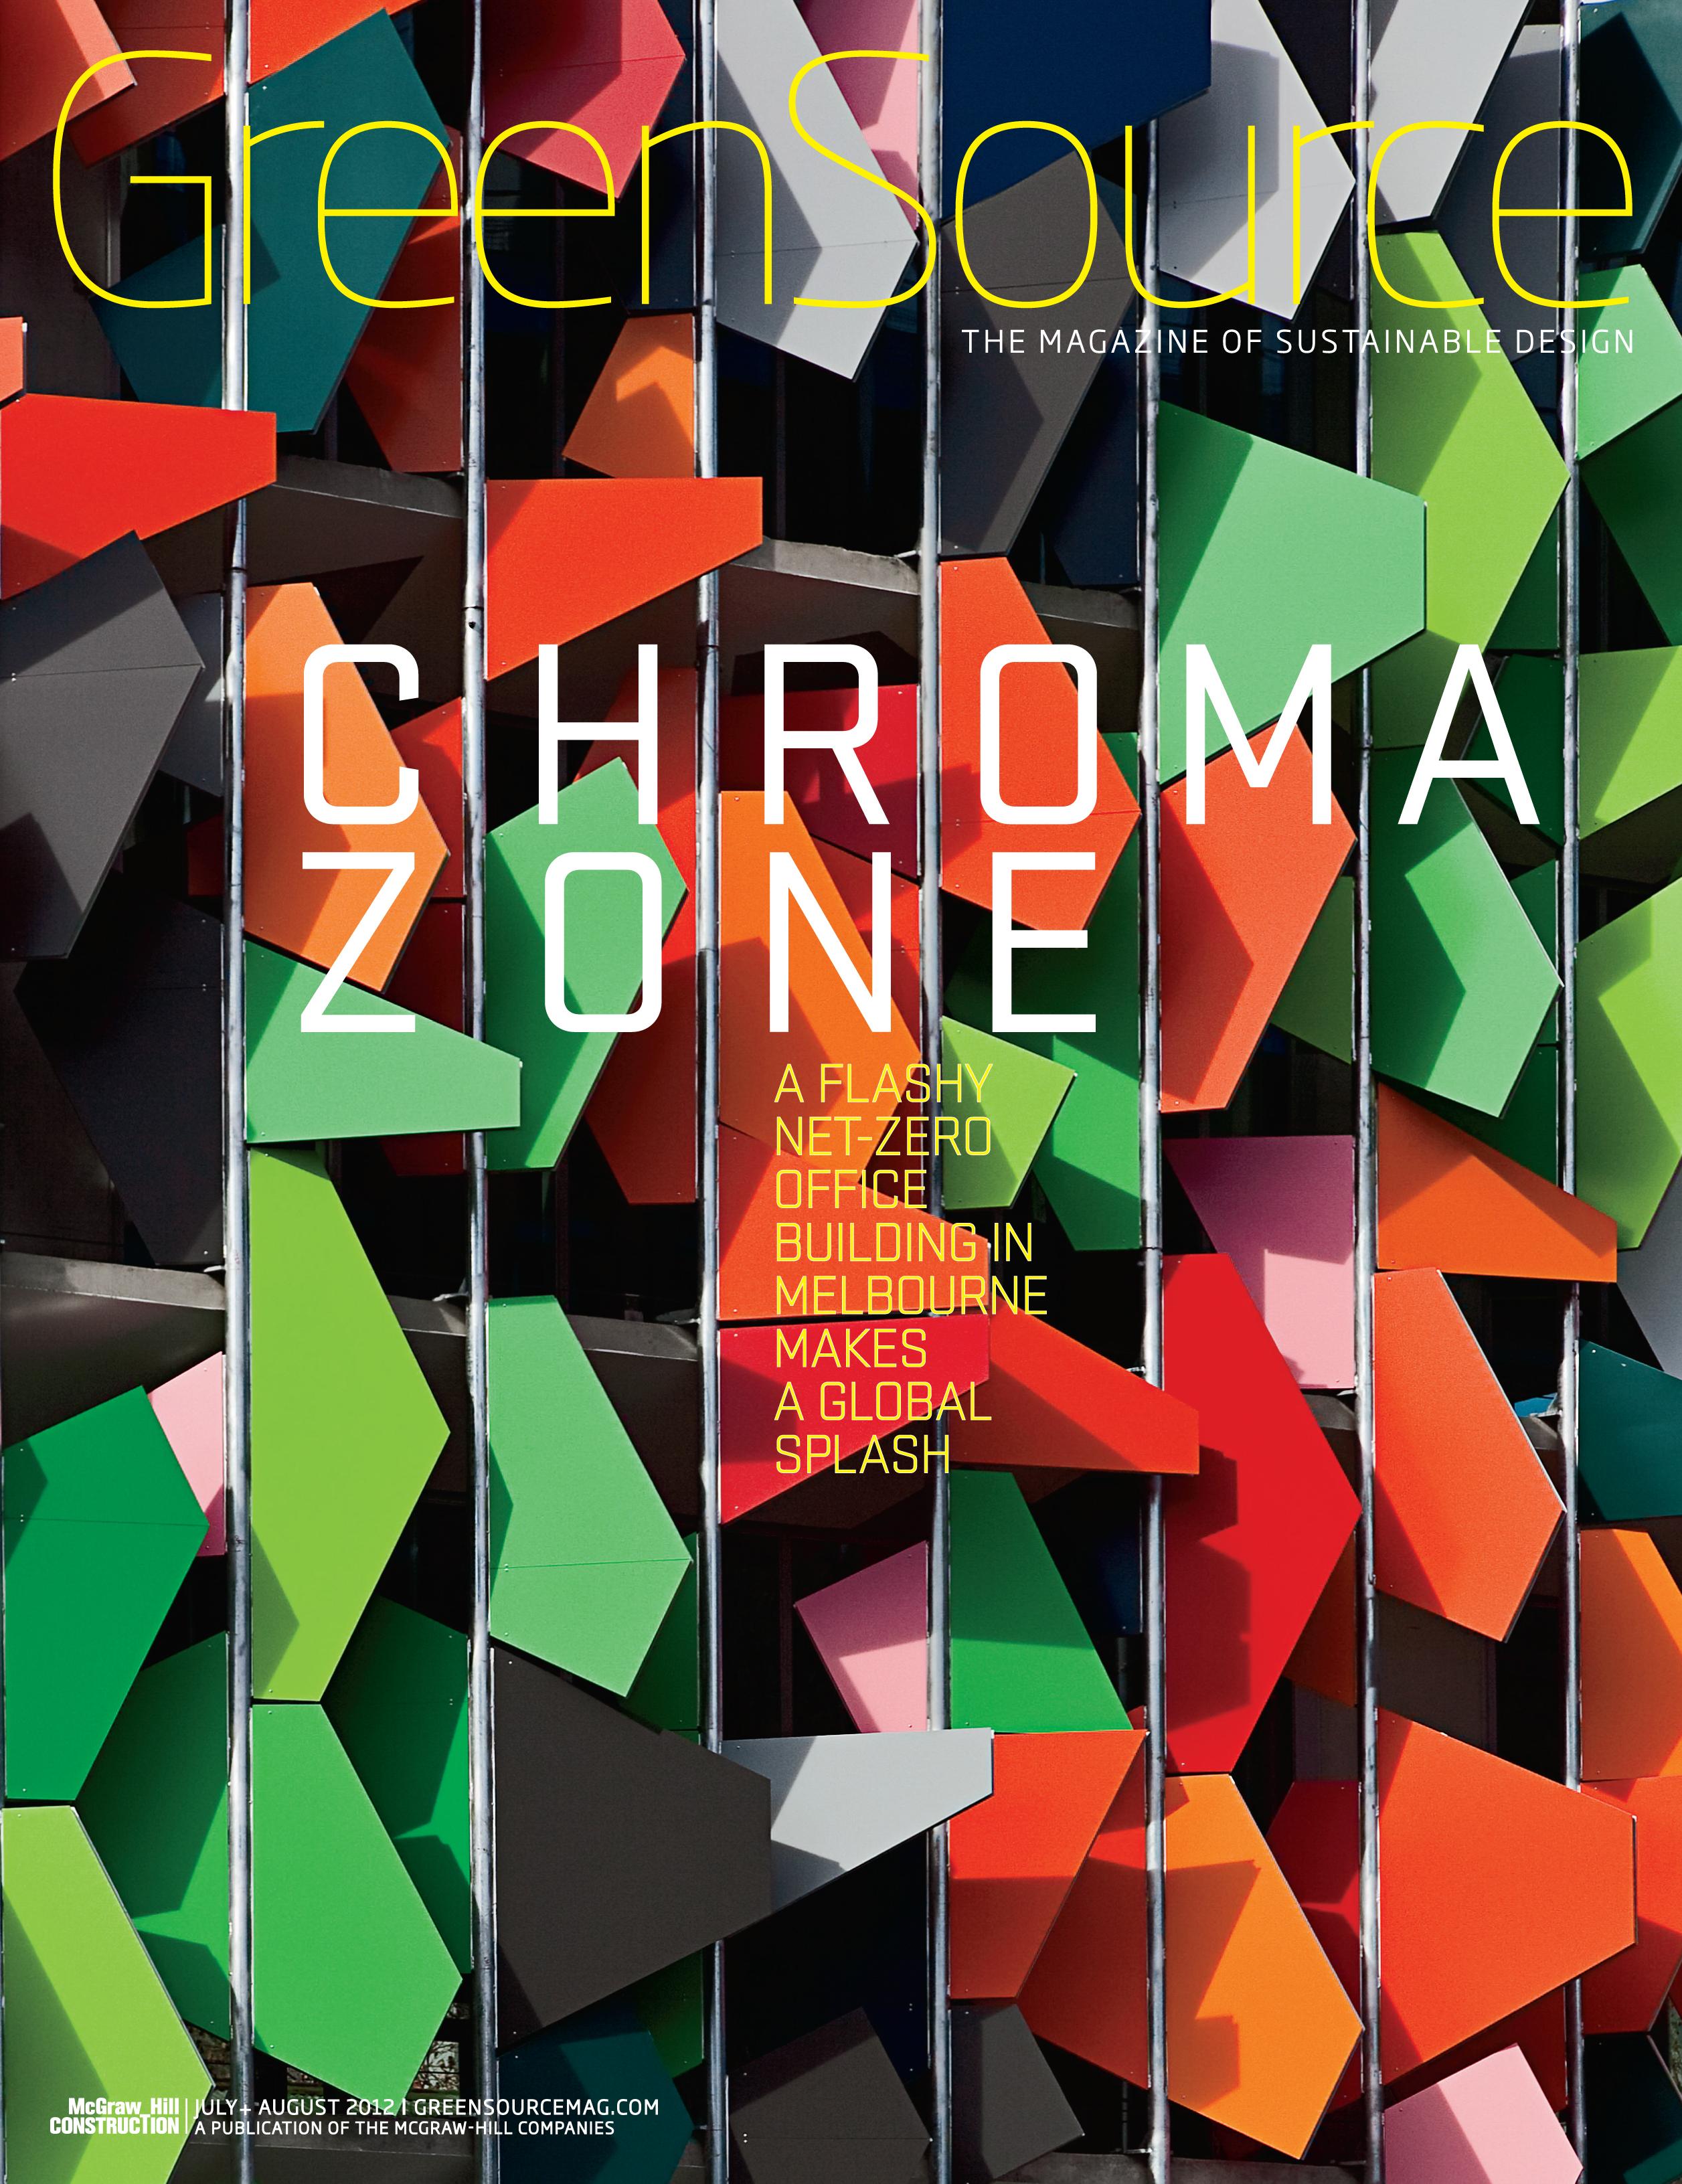 GreenSource Magazine